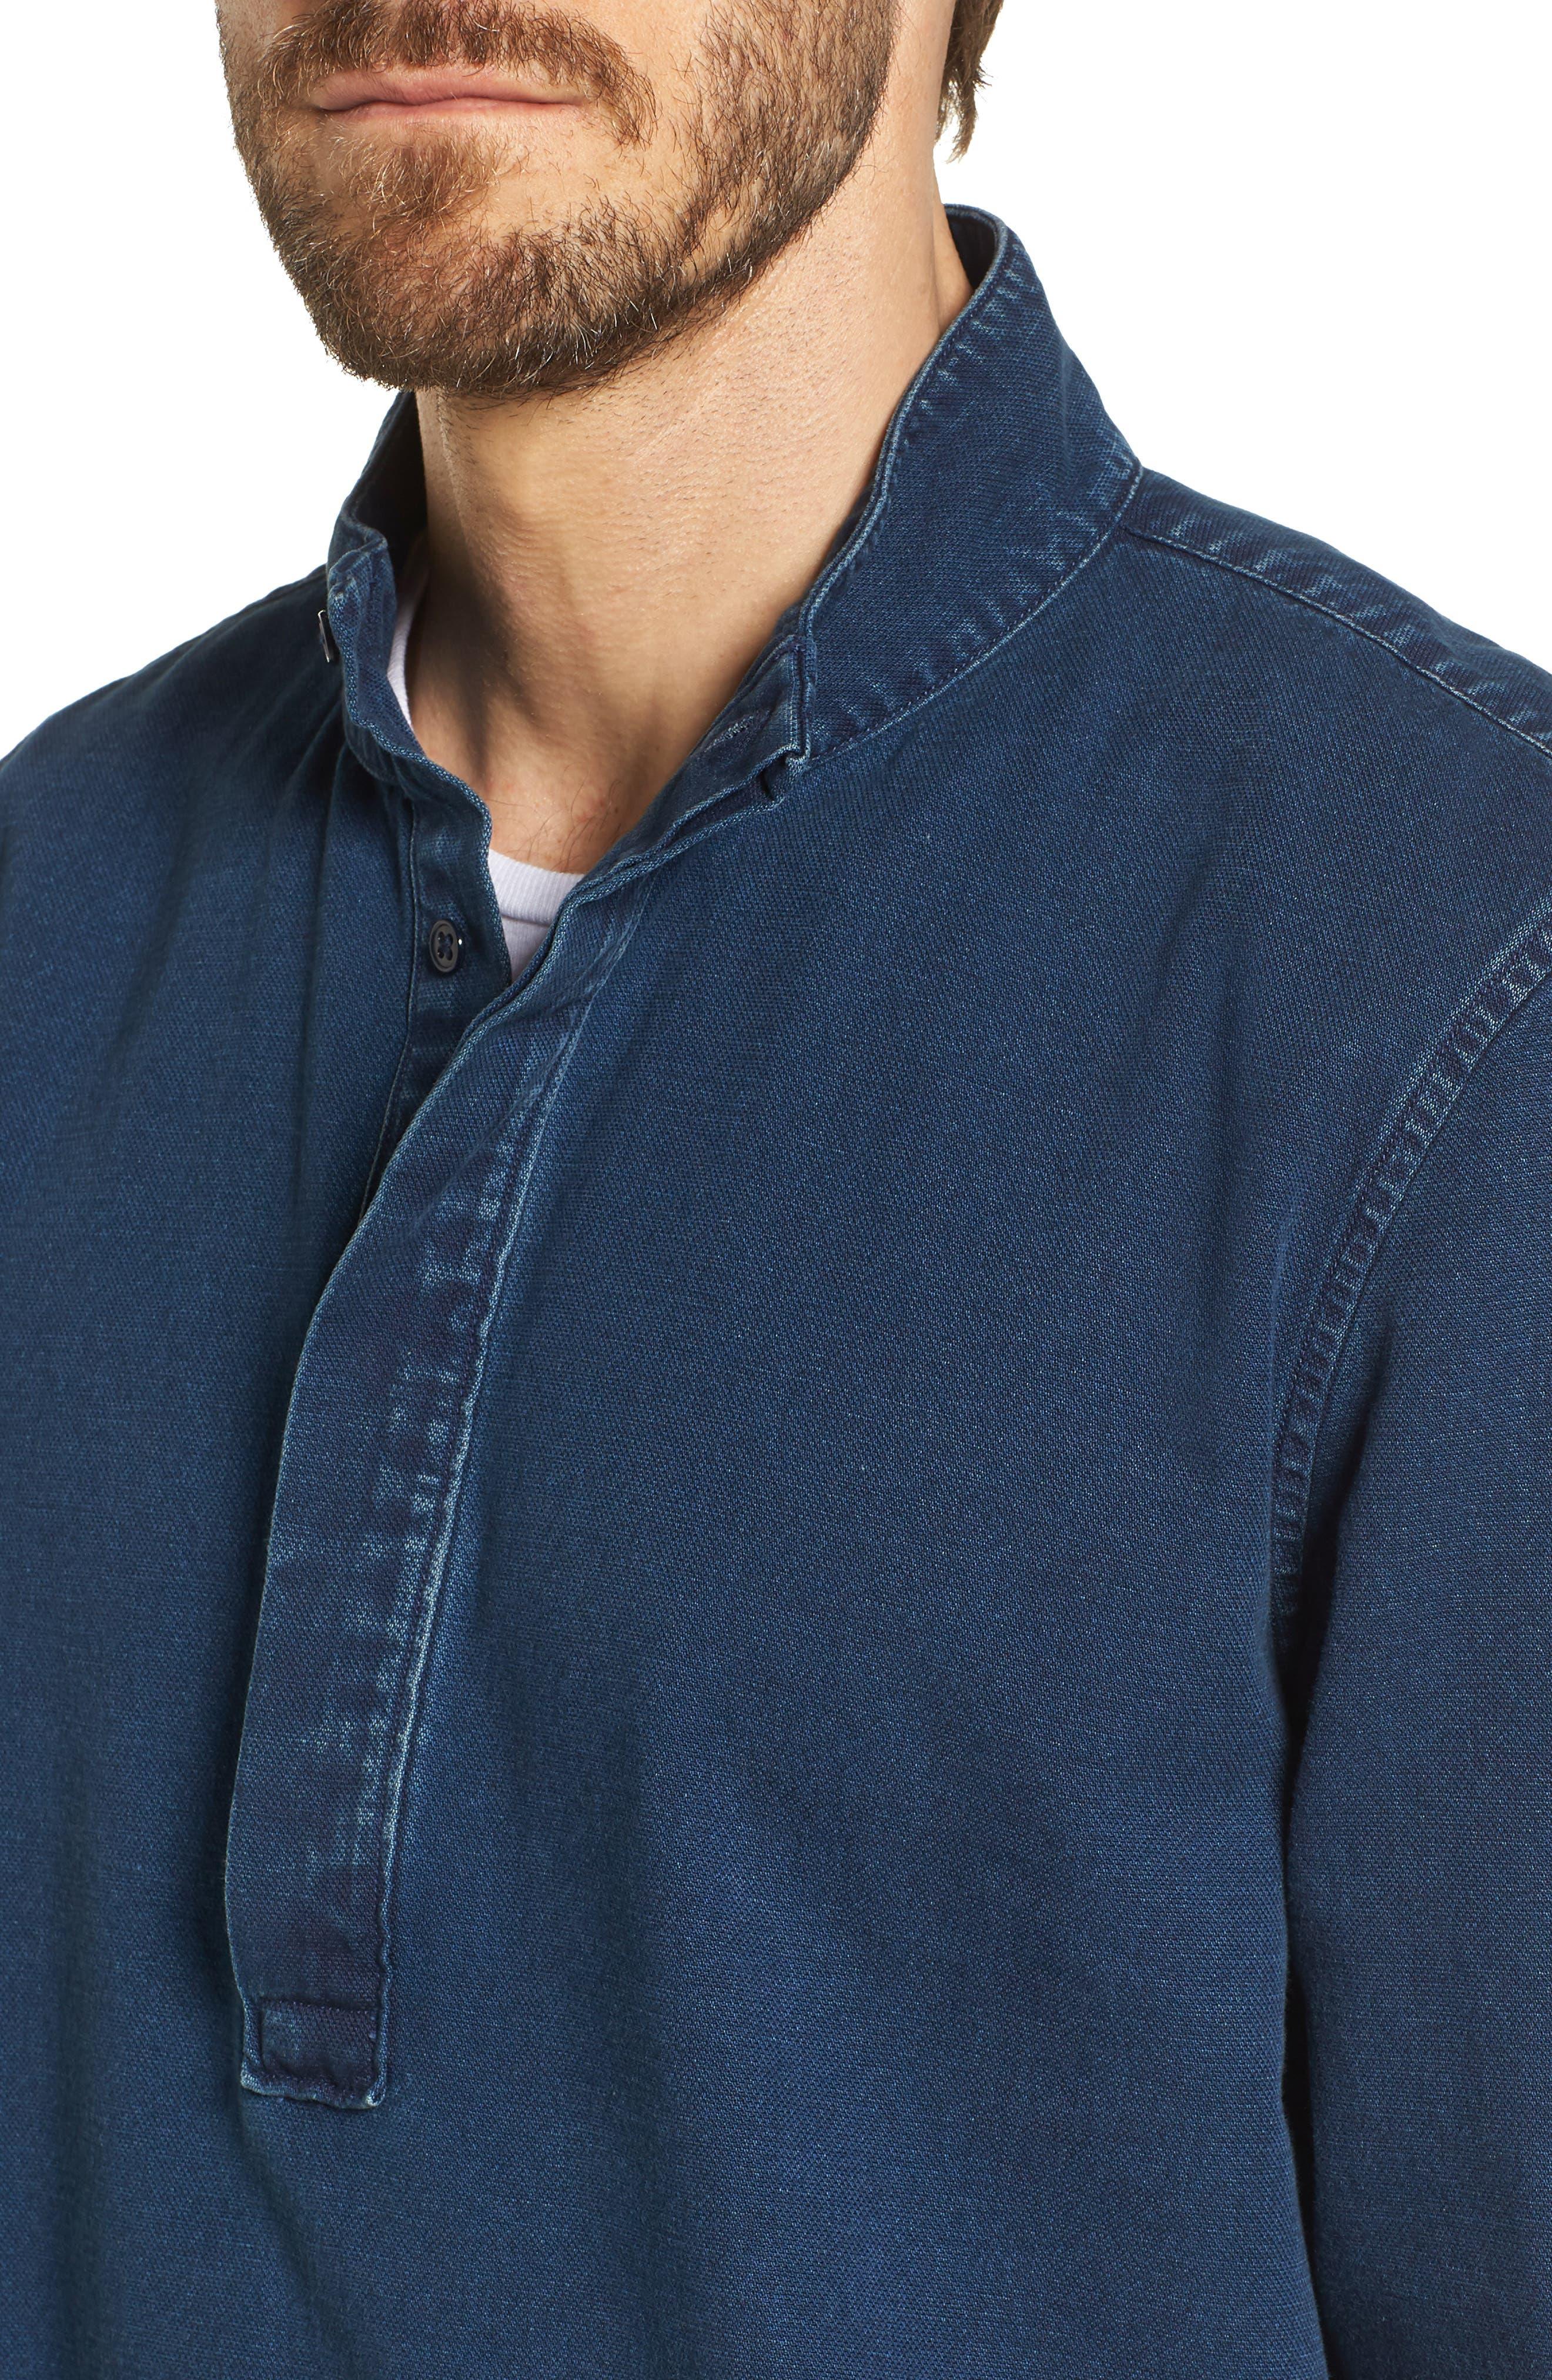 Band Collar Piqué Shirt,                             Alternate thumbnail 4, color,                             400